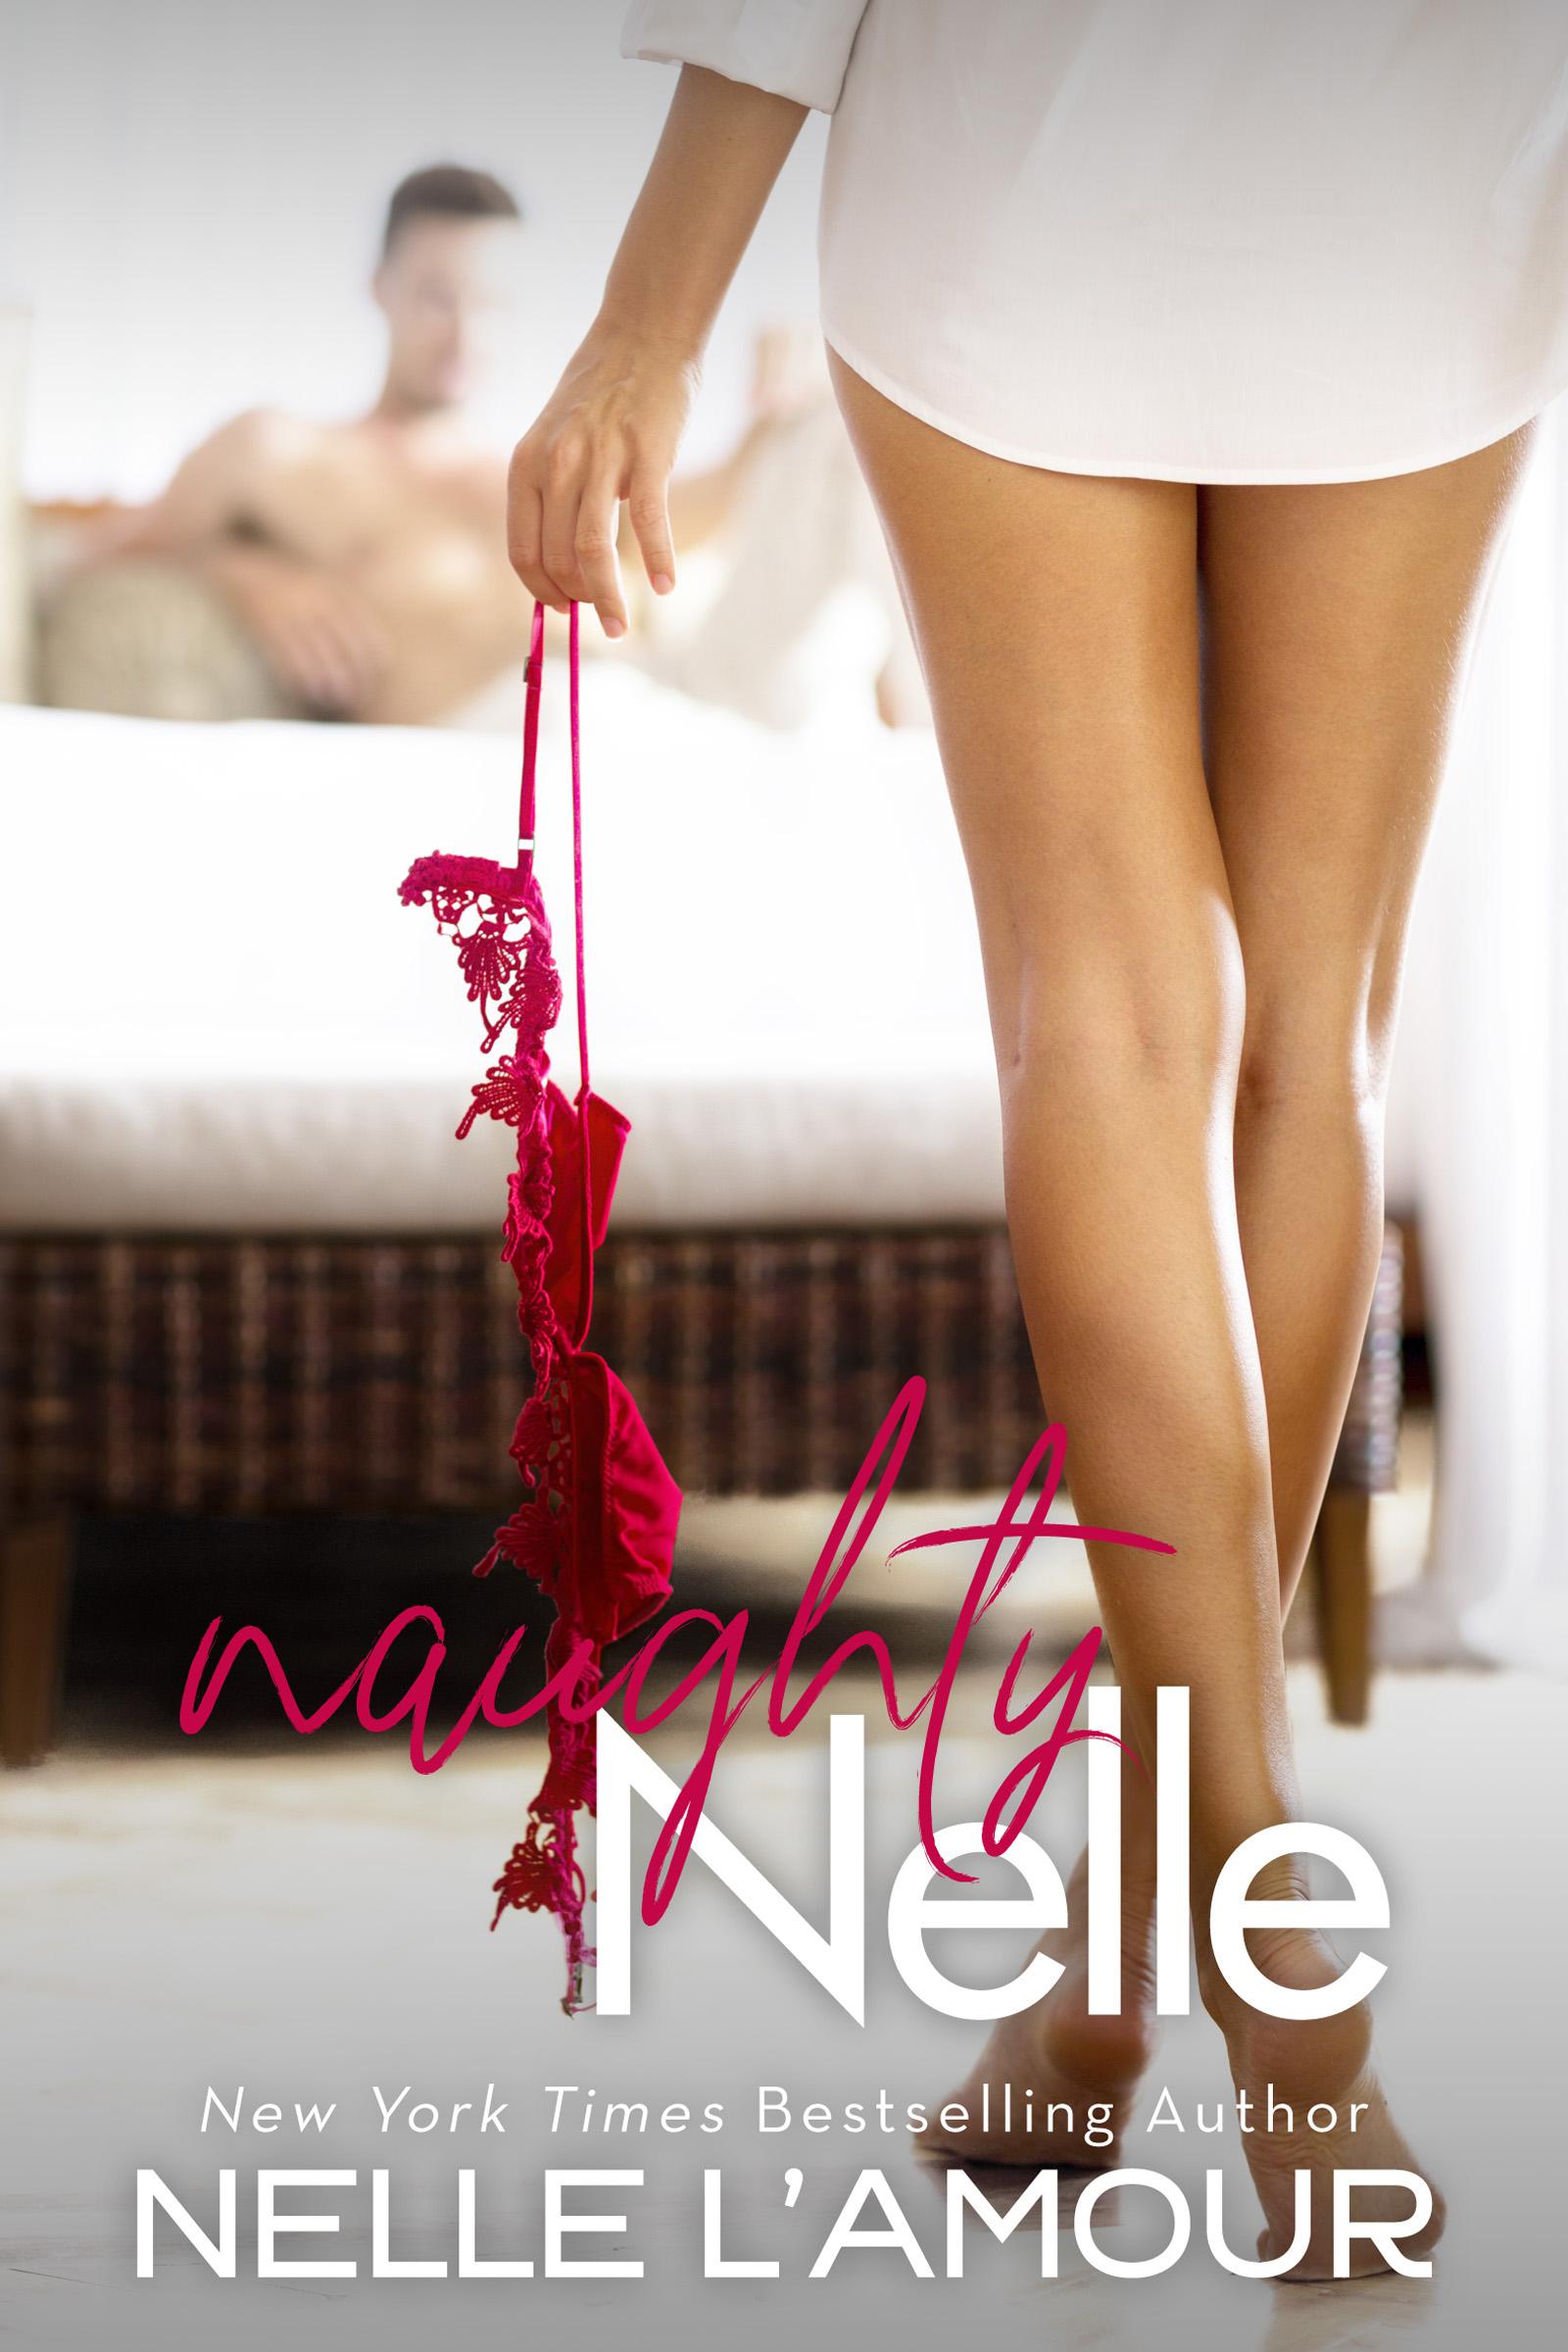 Naughty Nelle